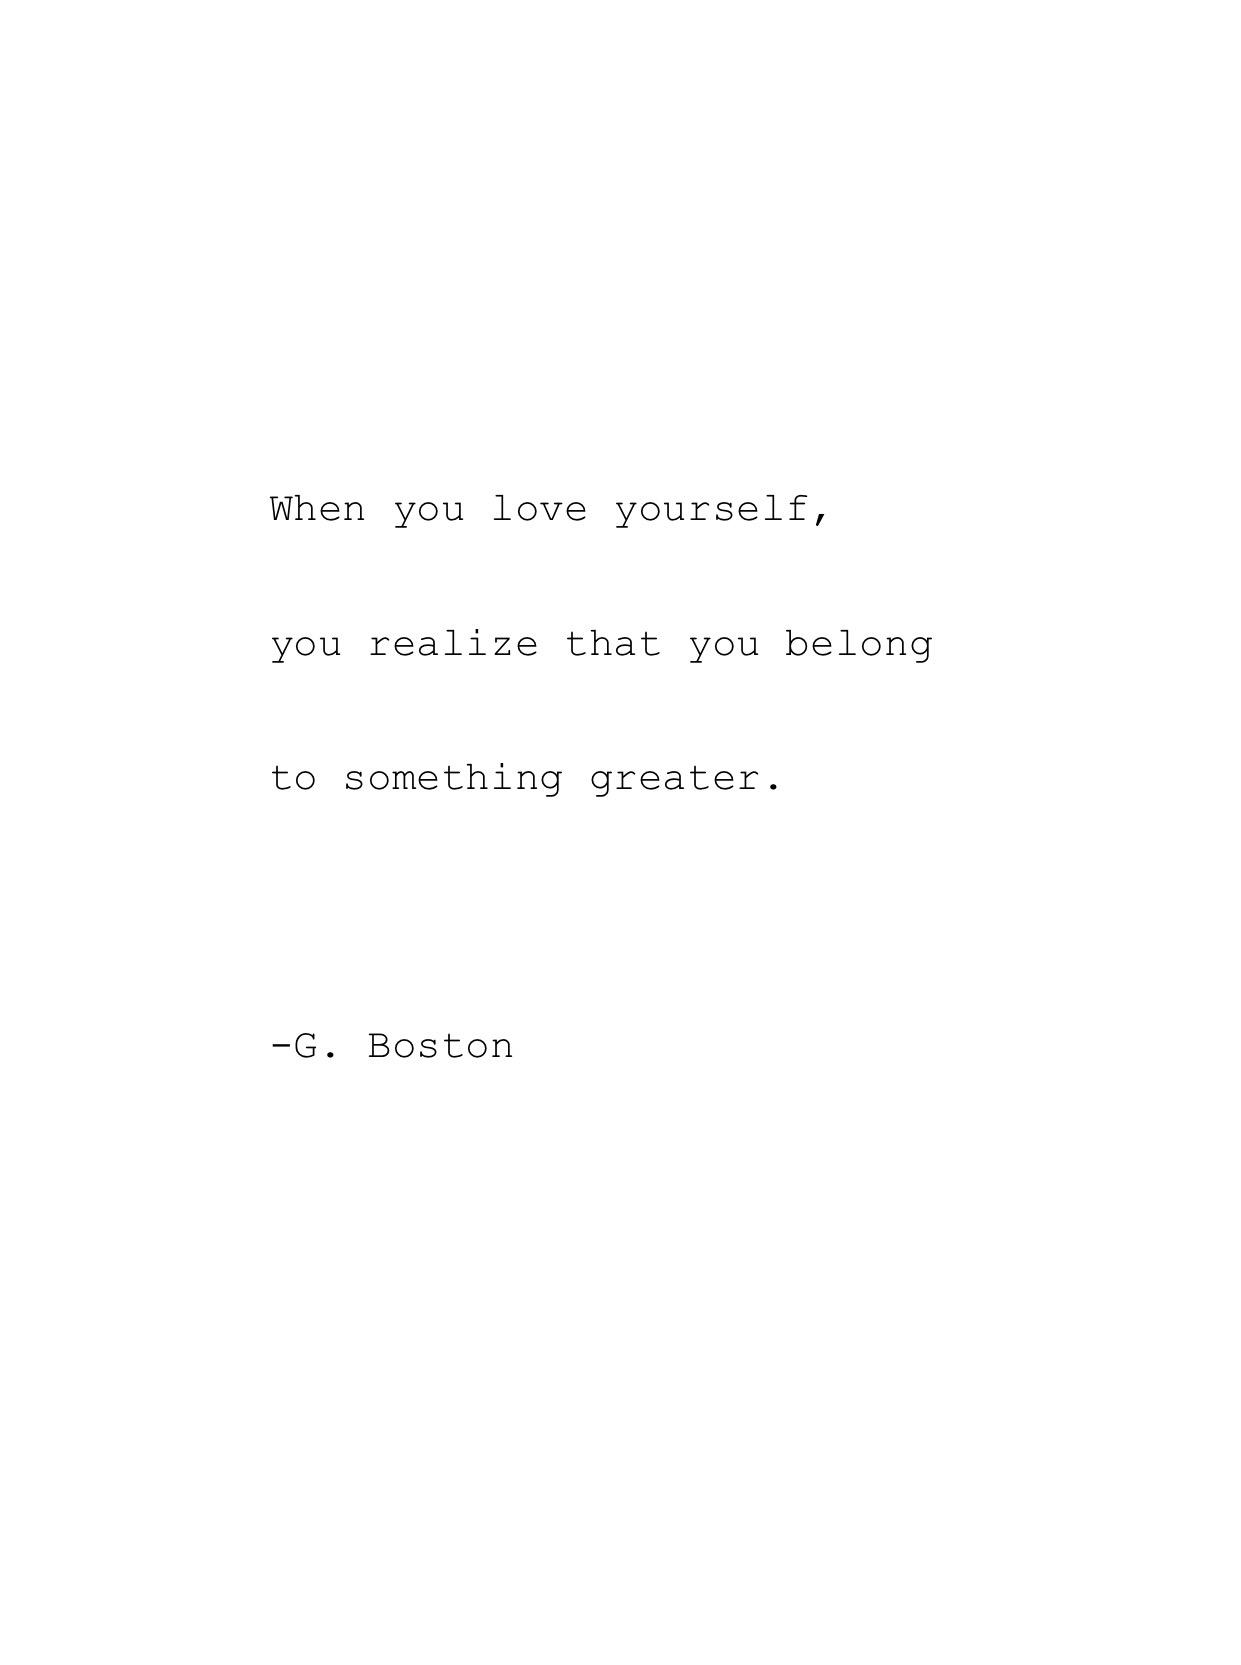 Love Poem Quotes Self Love  Musings At Random.